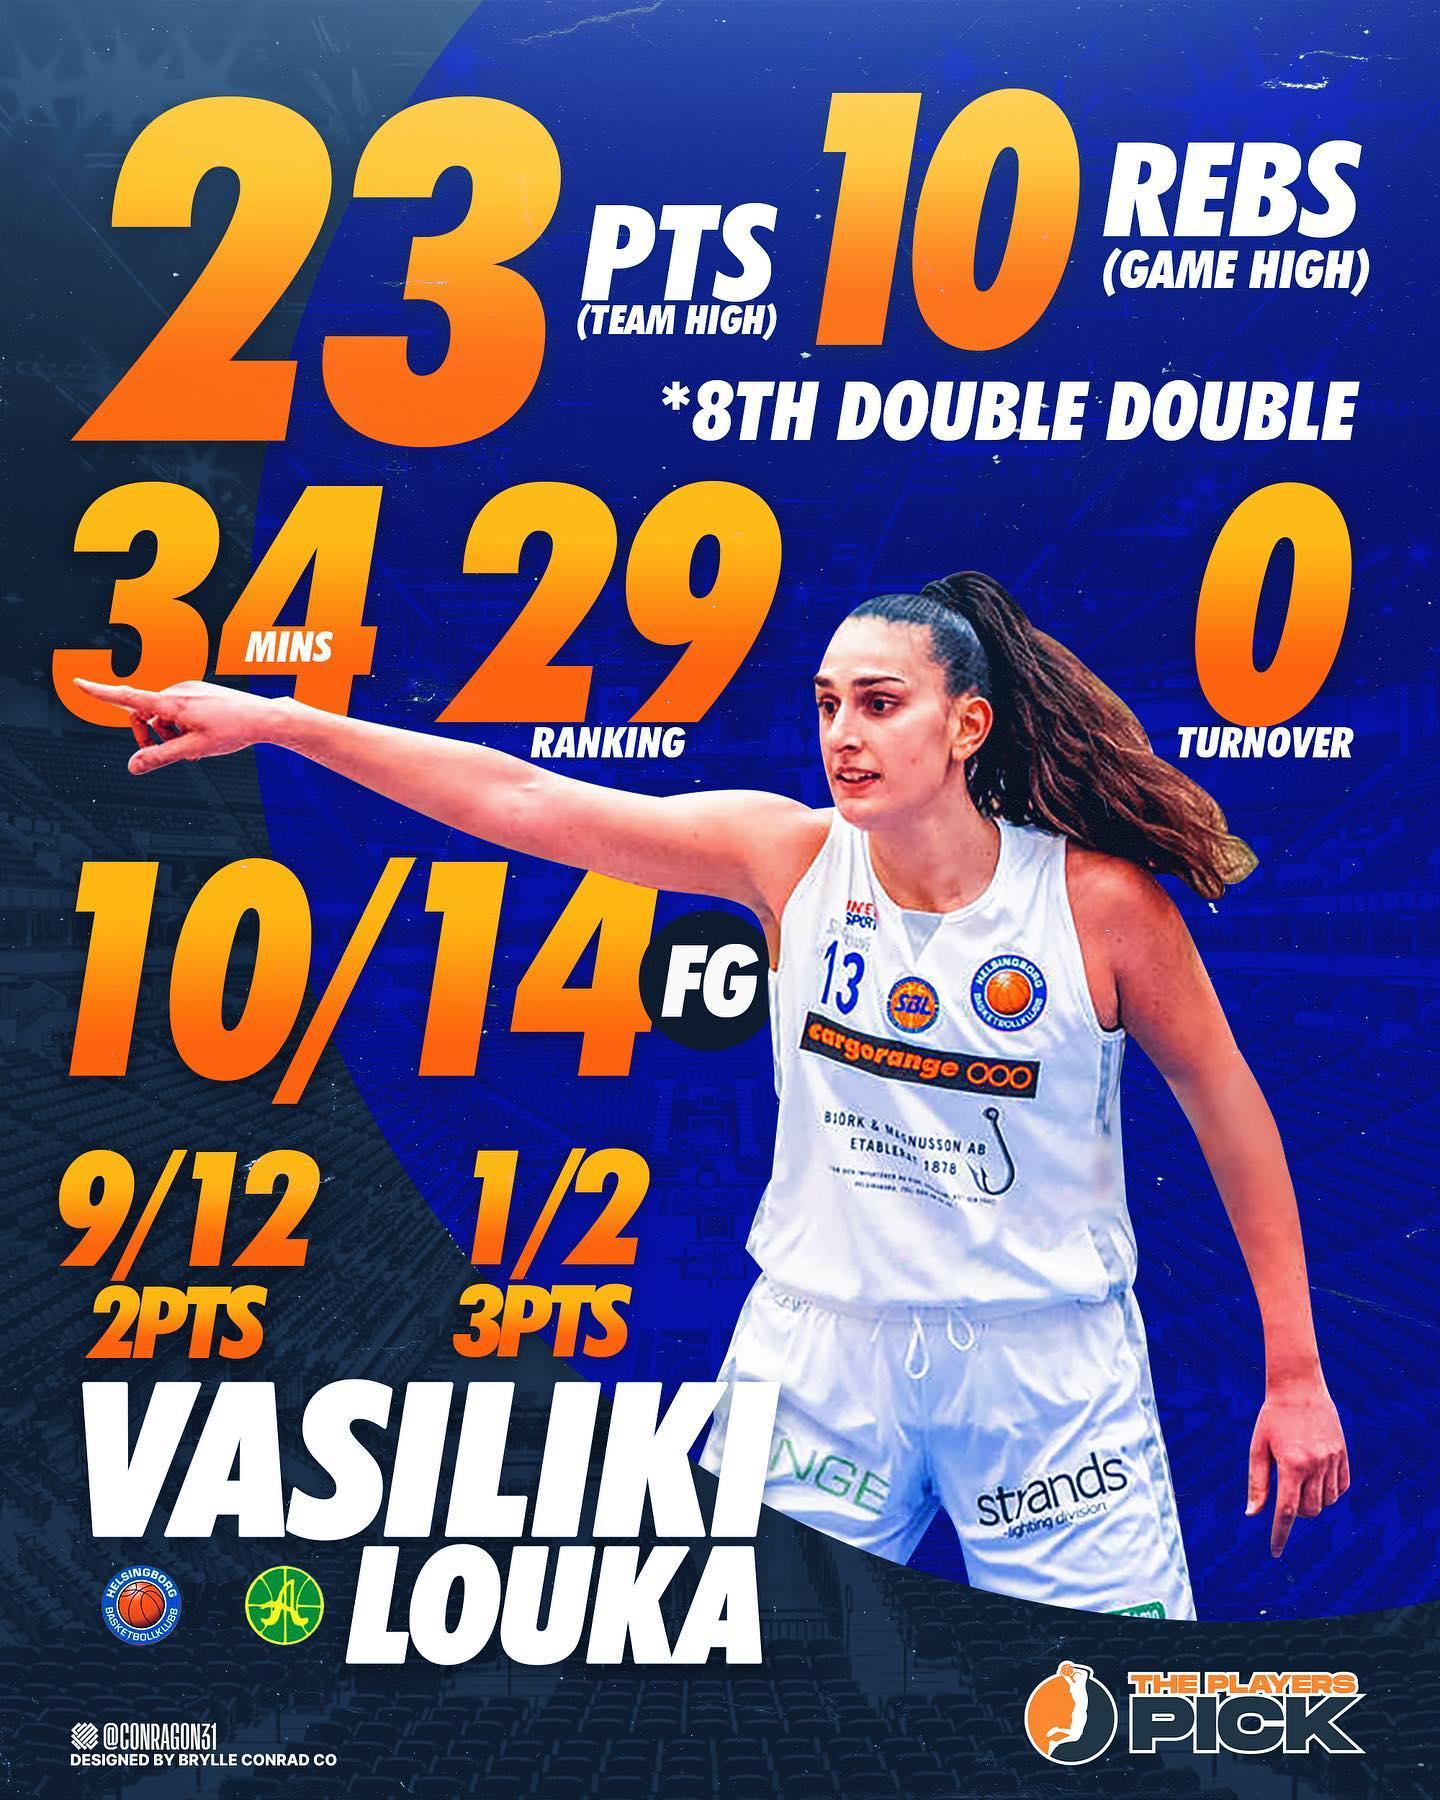 Louka was the MVP vs top-ranked Alvik – 23 points – 10 rebounds – 10/14 FG !